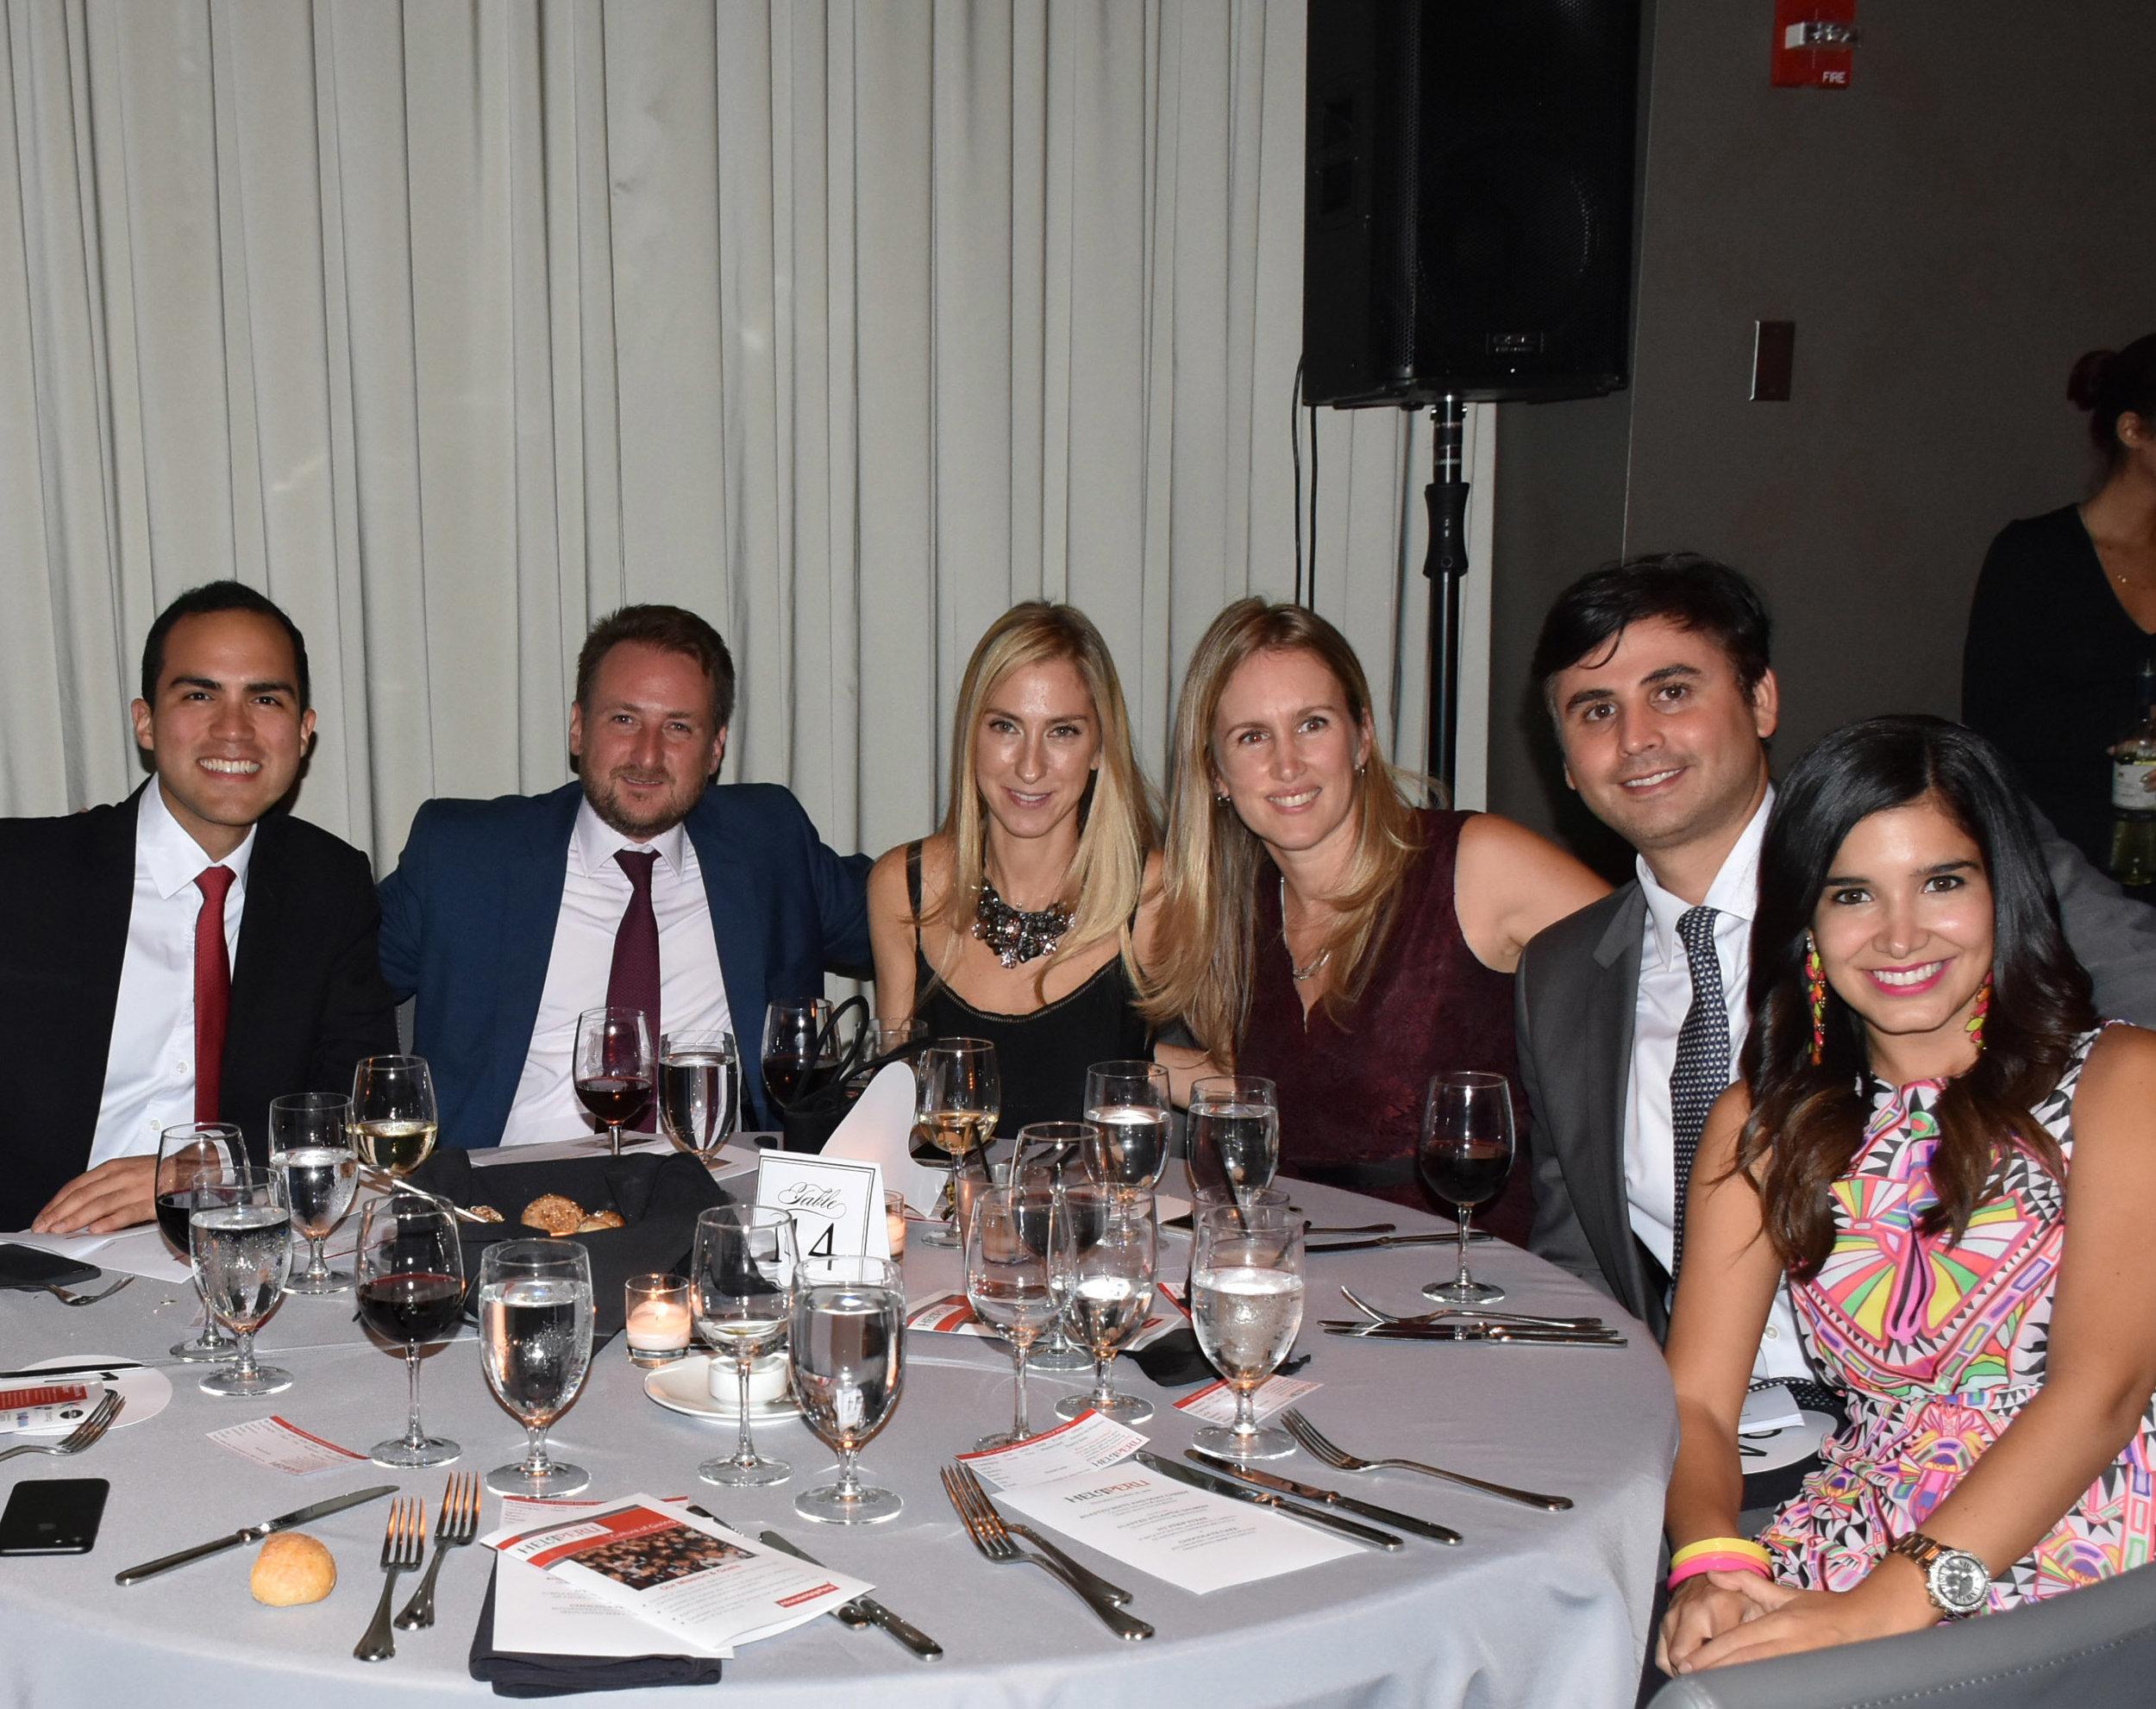 DSC_5104 - Joaquin Ormeno, Gordon Lee, Natalia Hrehoraszczuk, Muriel Jara, Luis Miguel Blondet y Marisol Tudela de Blondet.jpg